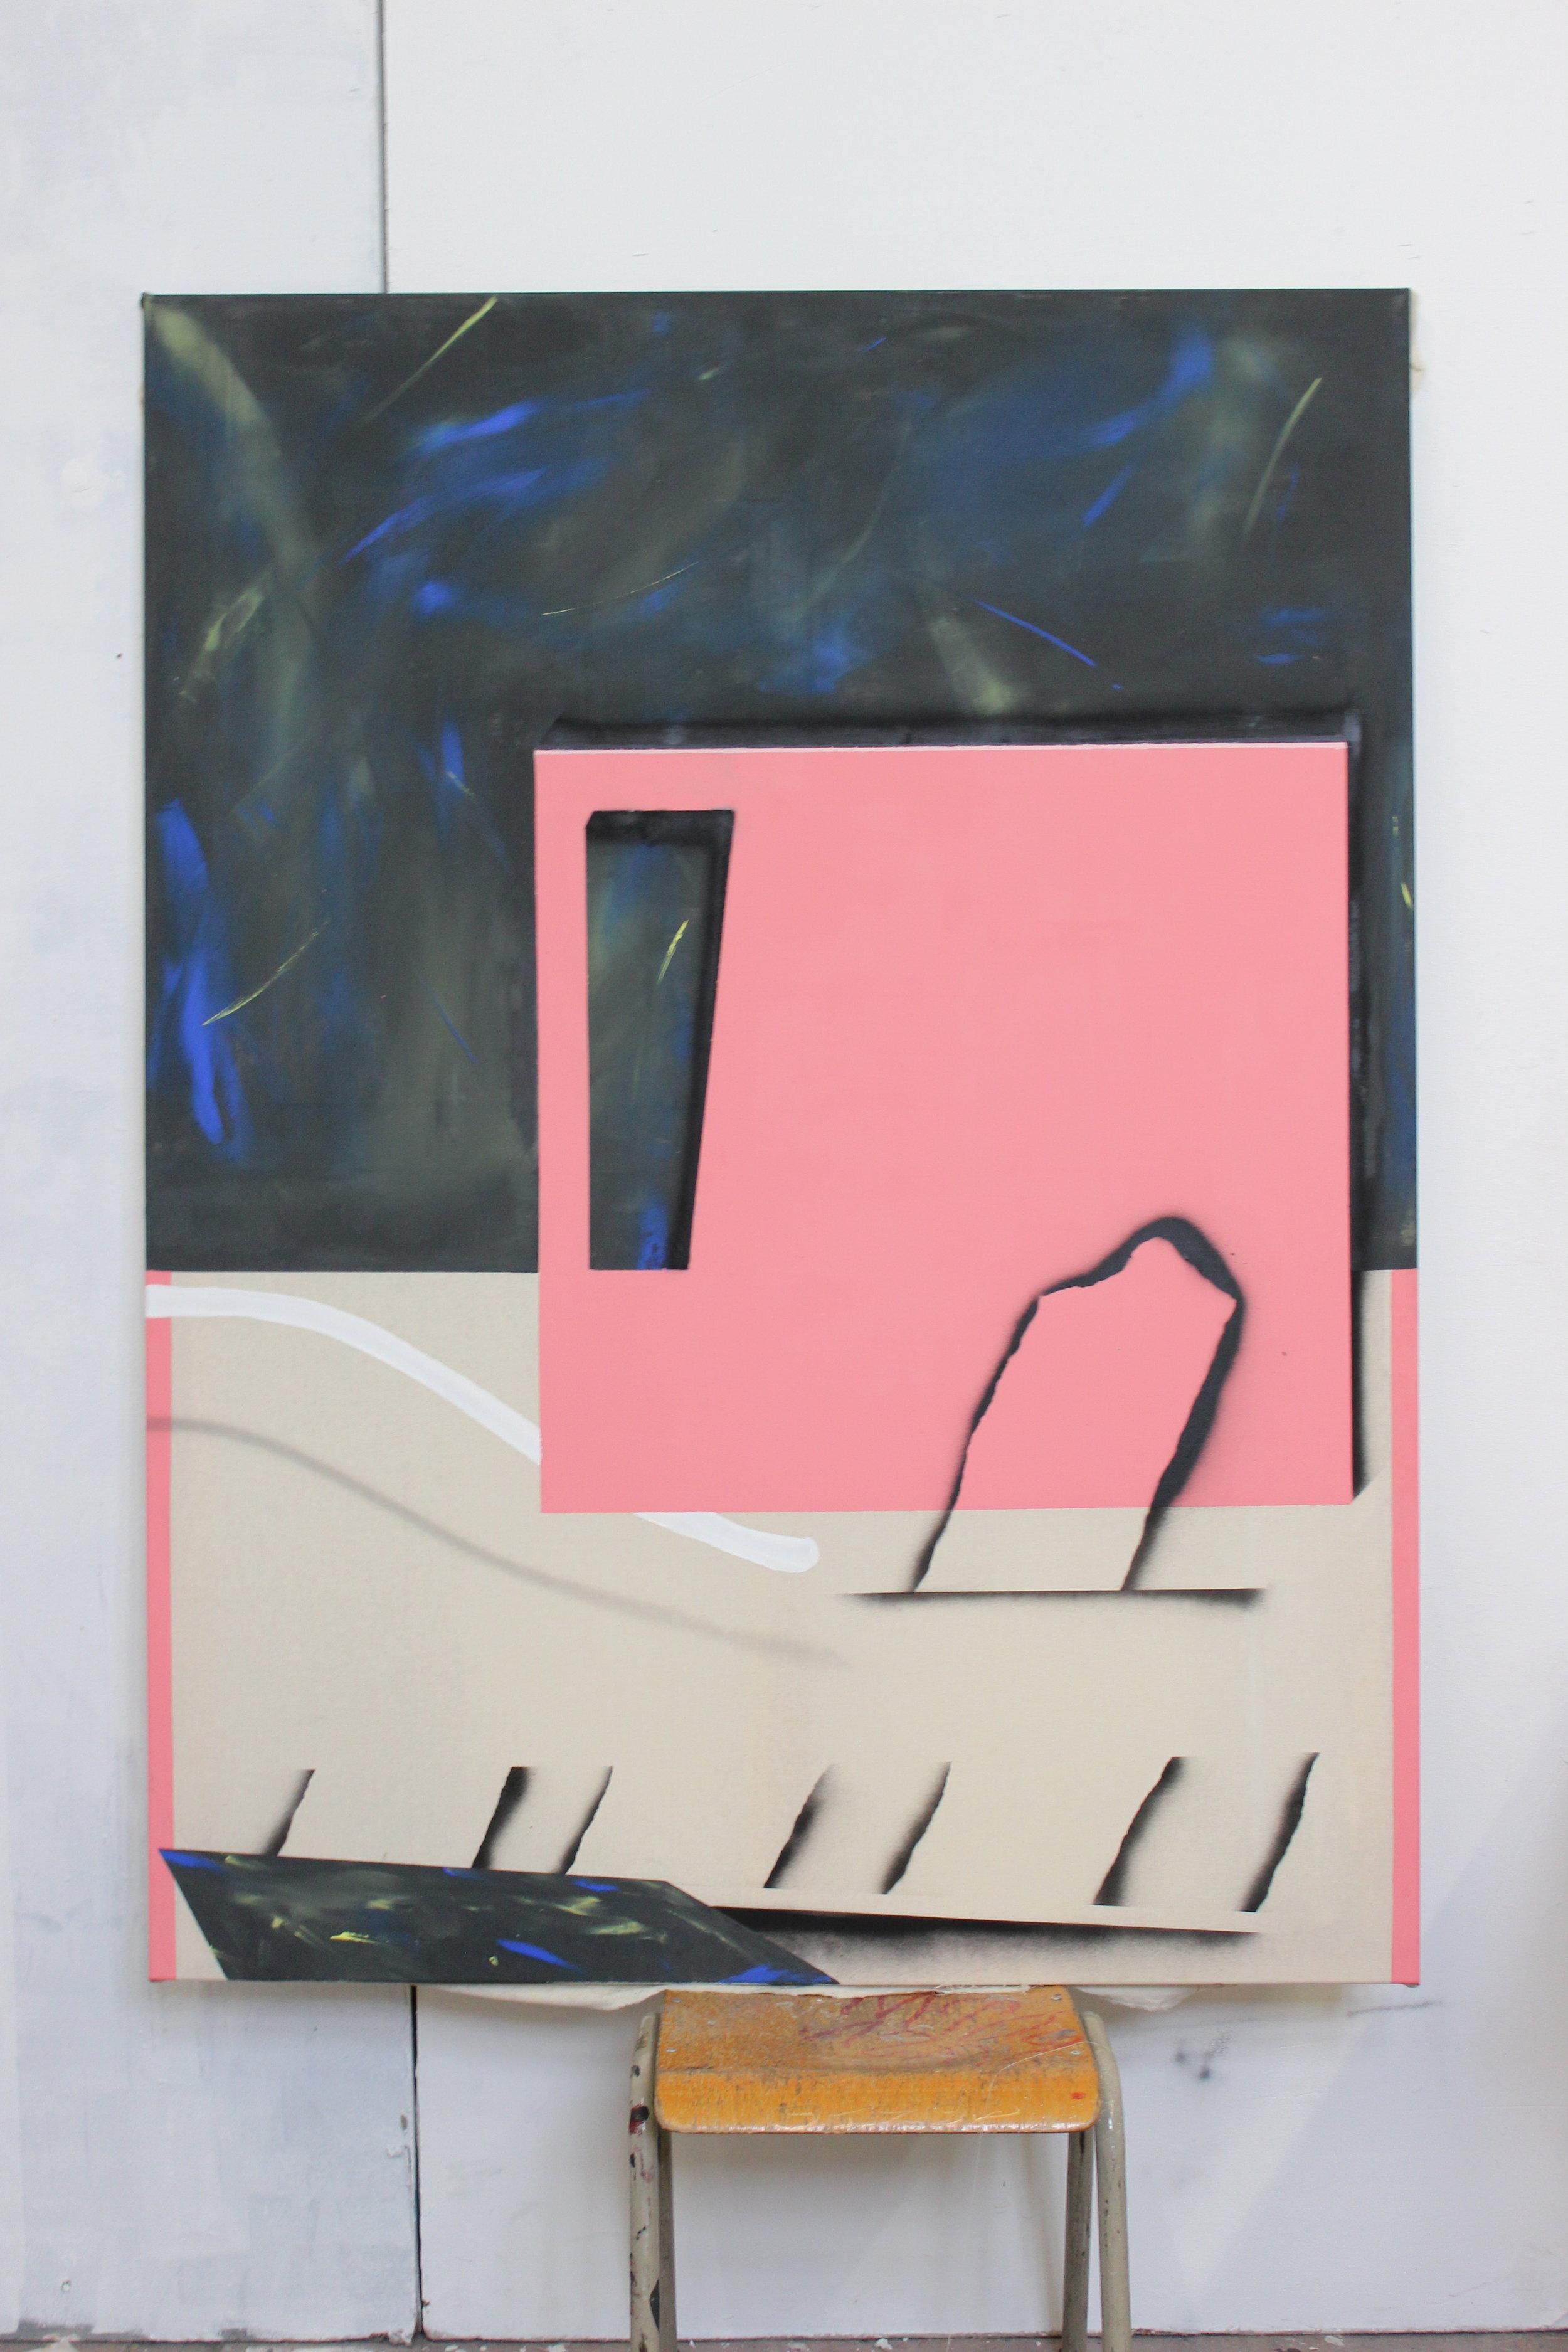 Romantic window 3 - Acrylic, oil & spray on canvas - 120 x 160 cm - 2018